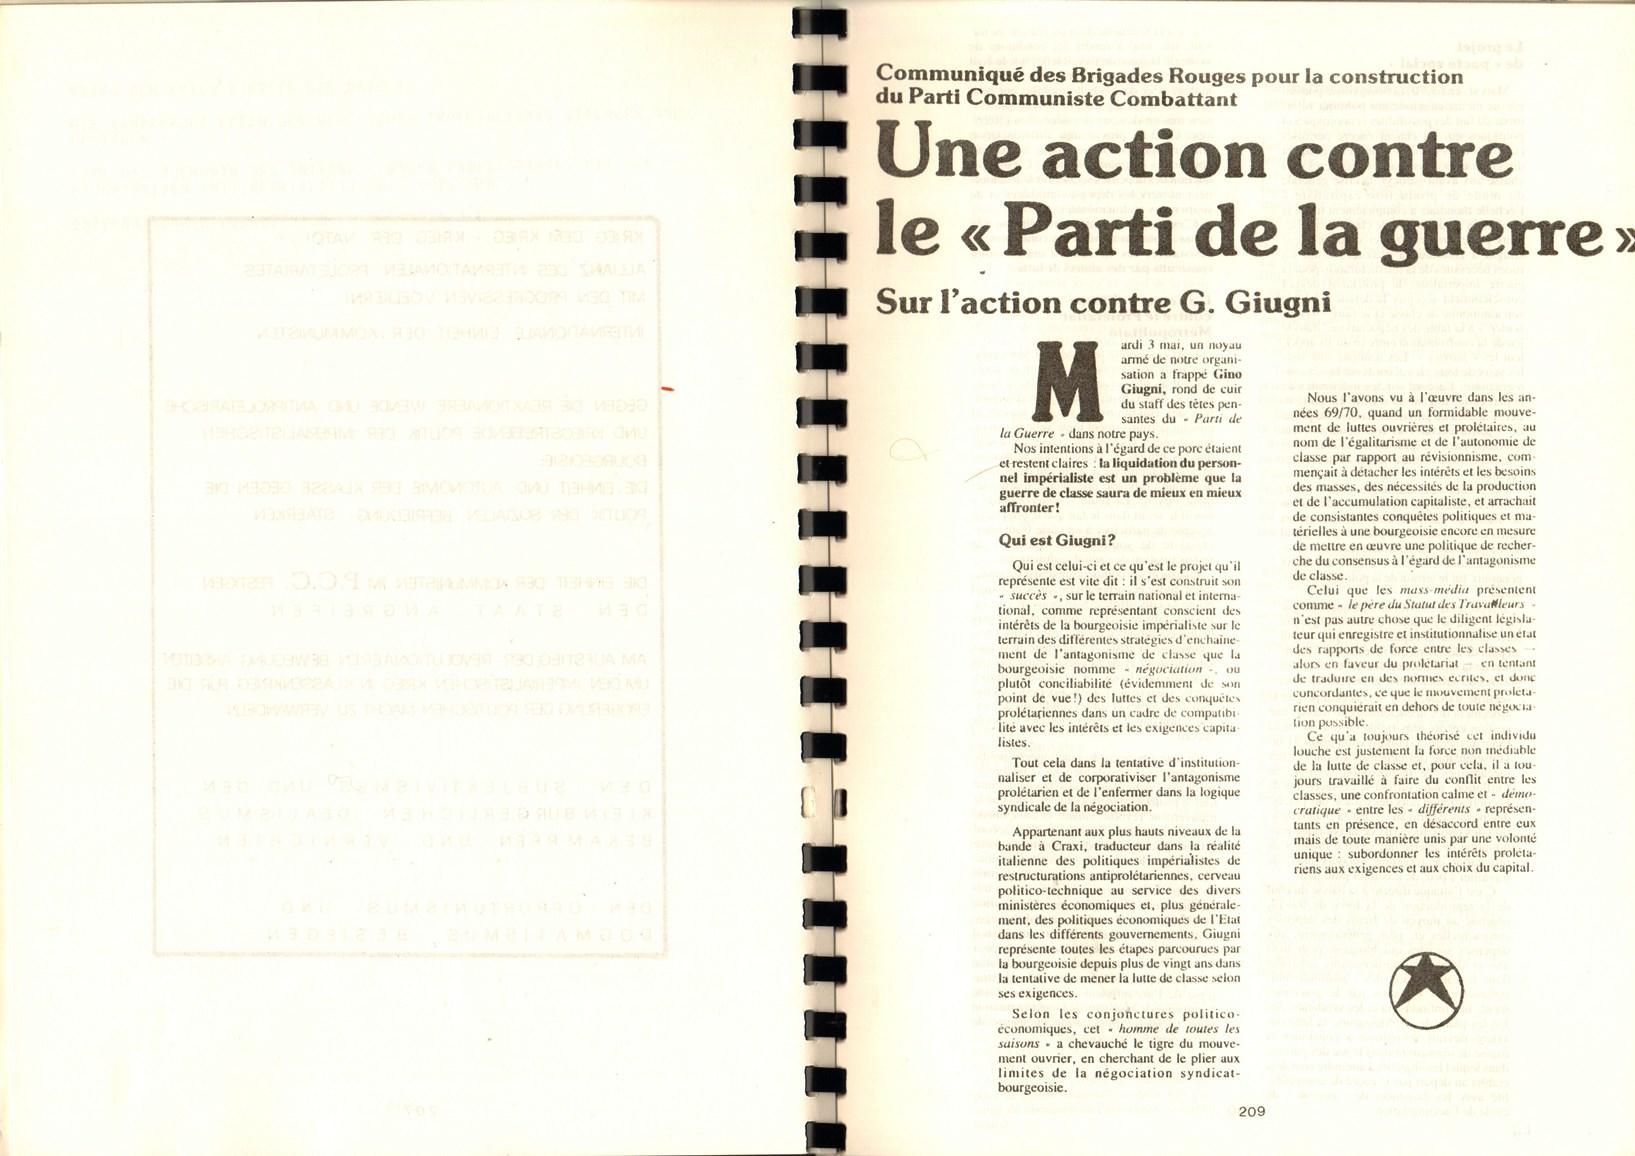 Internationale_Debatte_1985_Brigate_Rosse_105